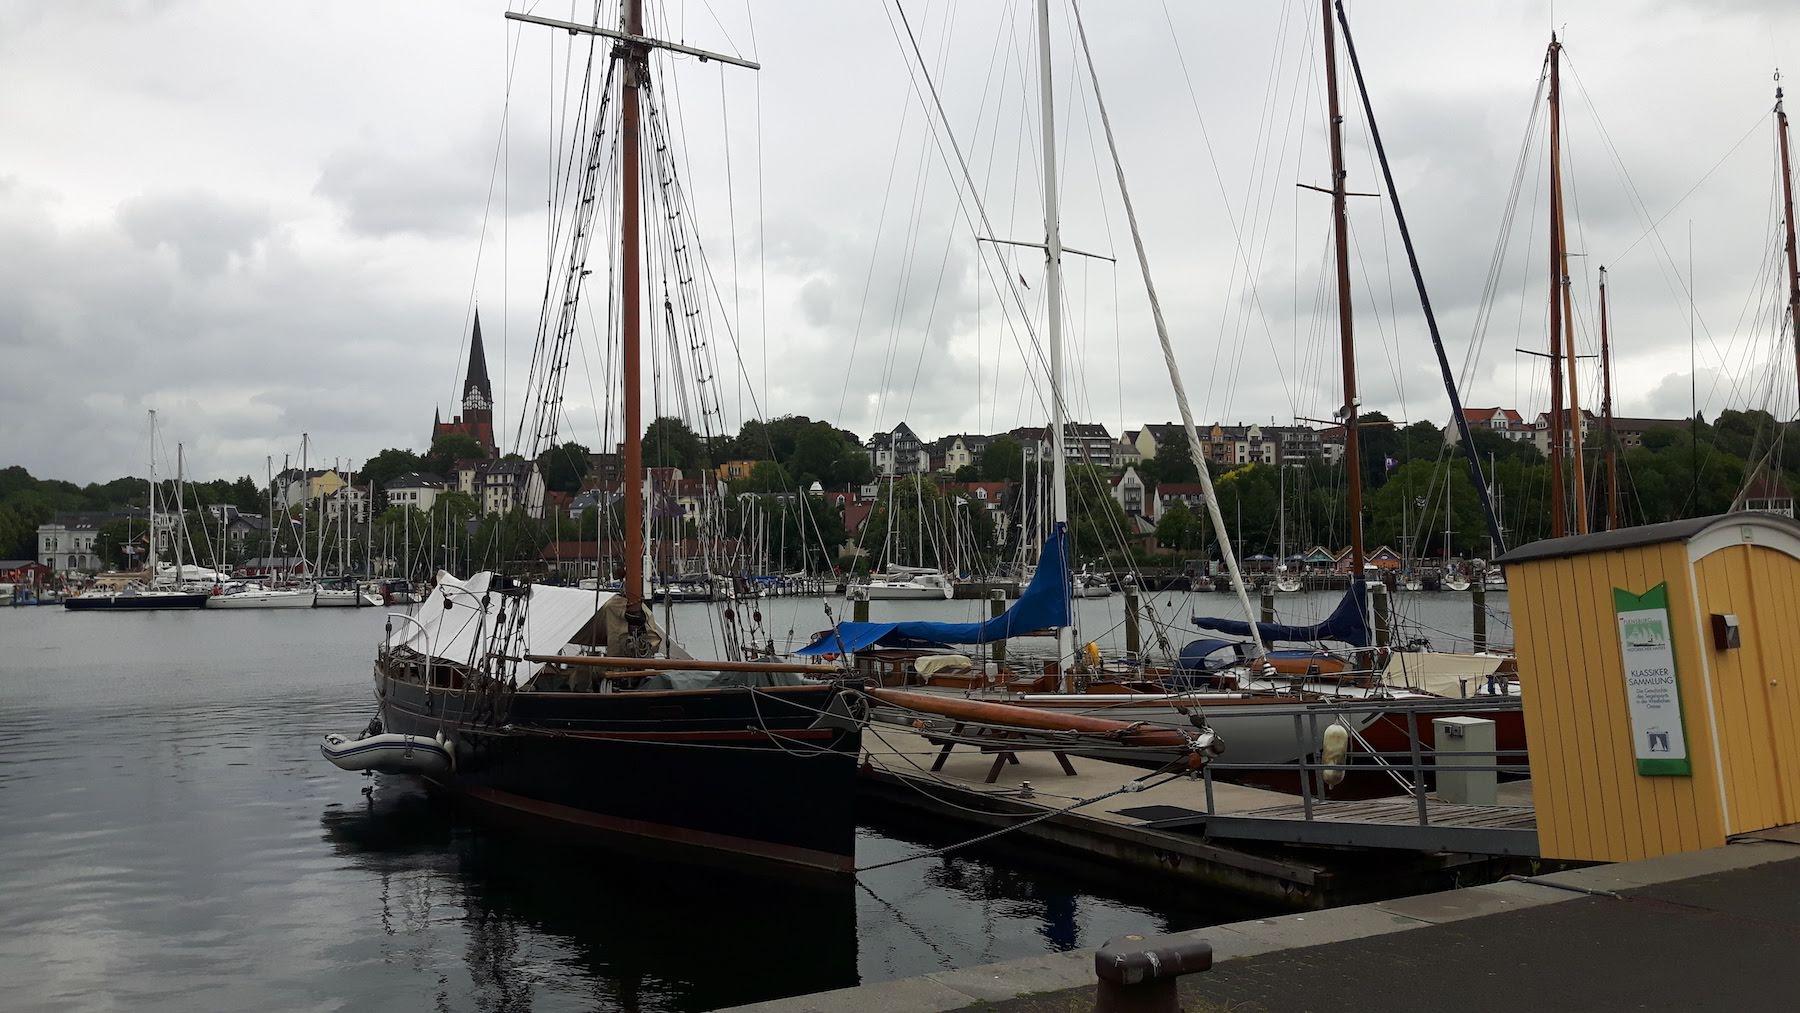 Flensburg Schlifbrucke Harbour